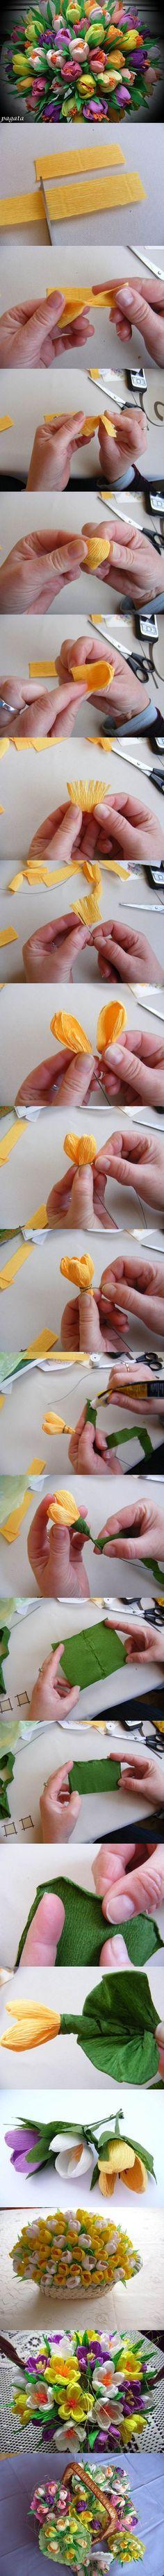 DIY  Bouquet of Crepe Paper Crocuses  http://www.icreativeideas.com/diy-beautiful-bouquet-of-crepe-paper-crocuses/